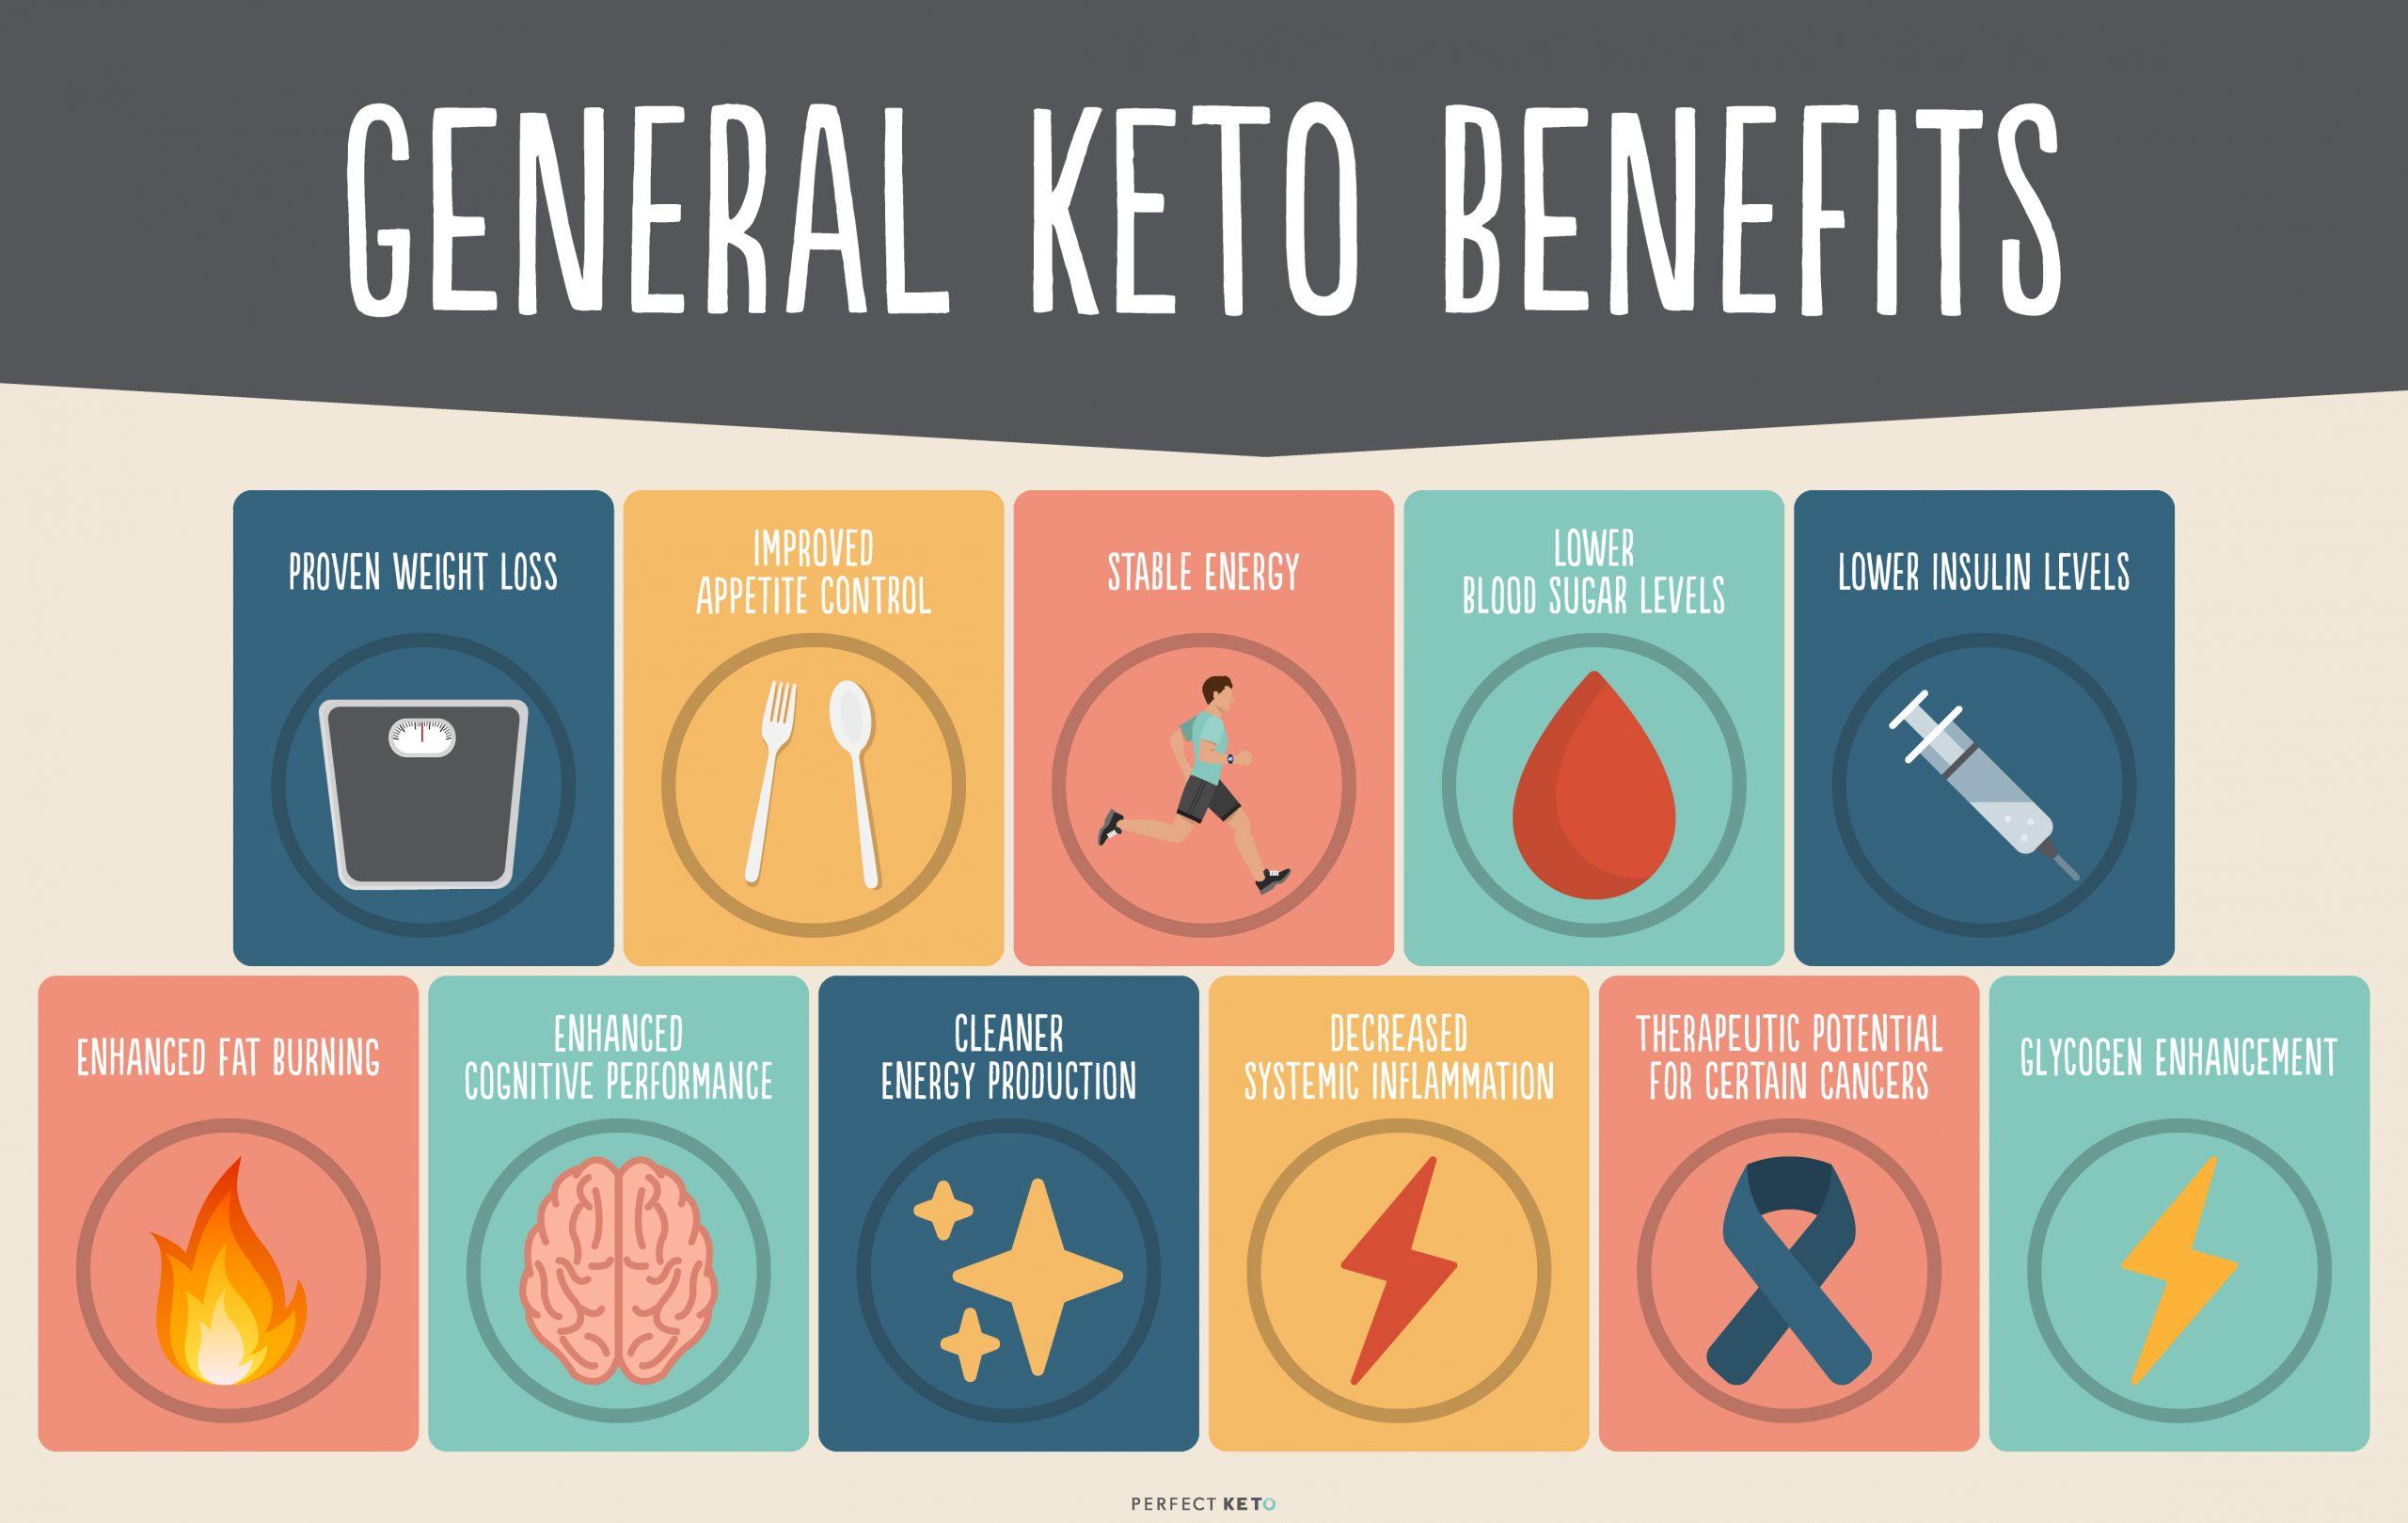 General keto benefits